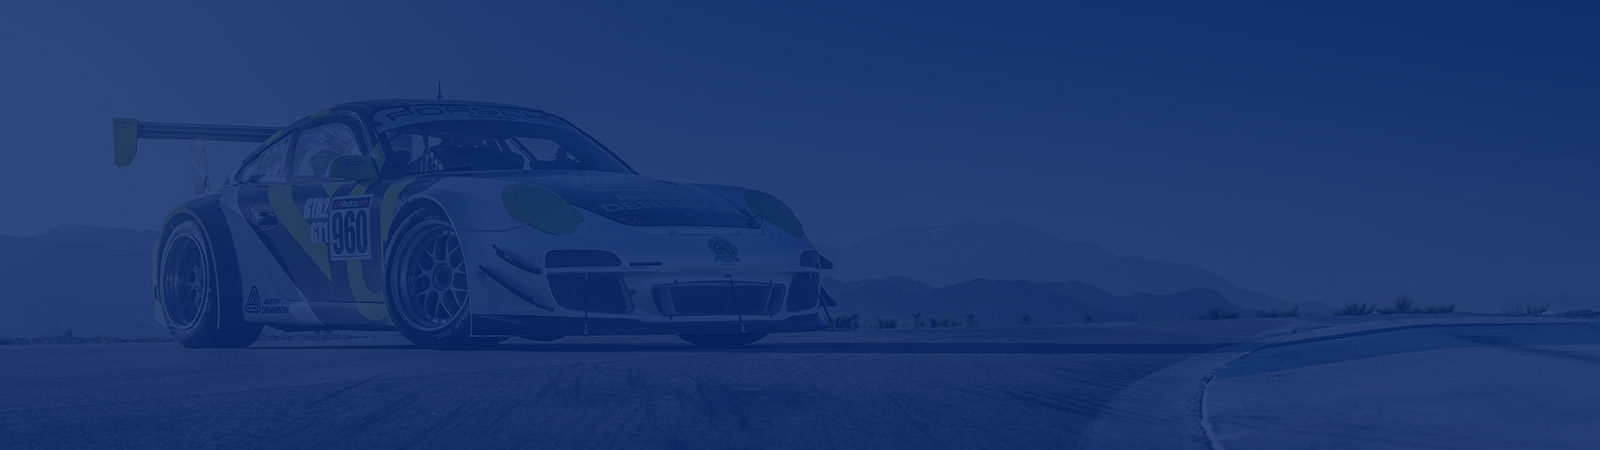 Avery Dennison Porsche Racing Livery